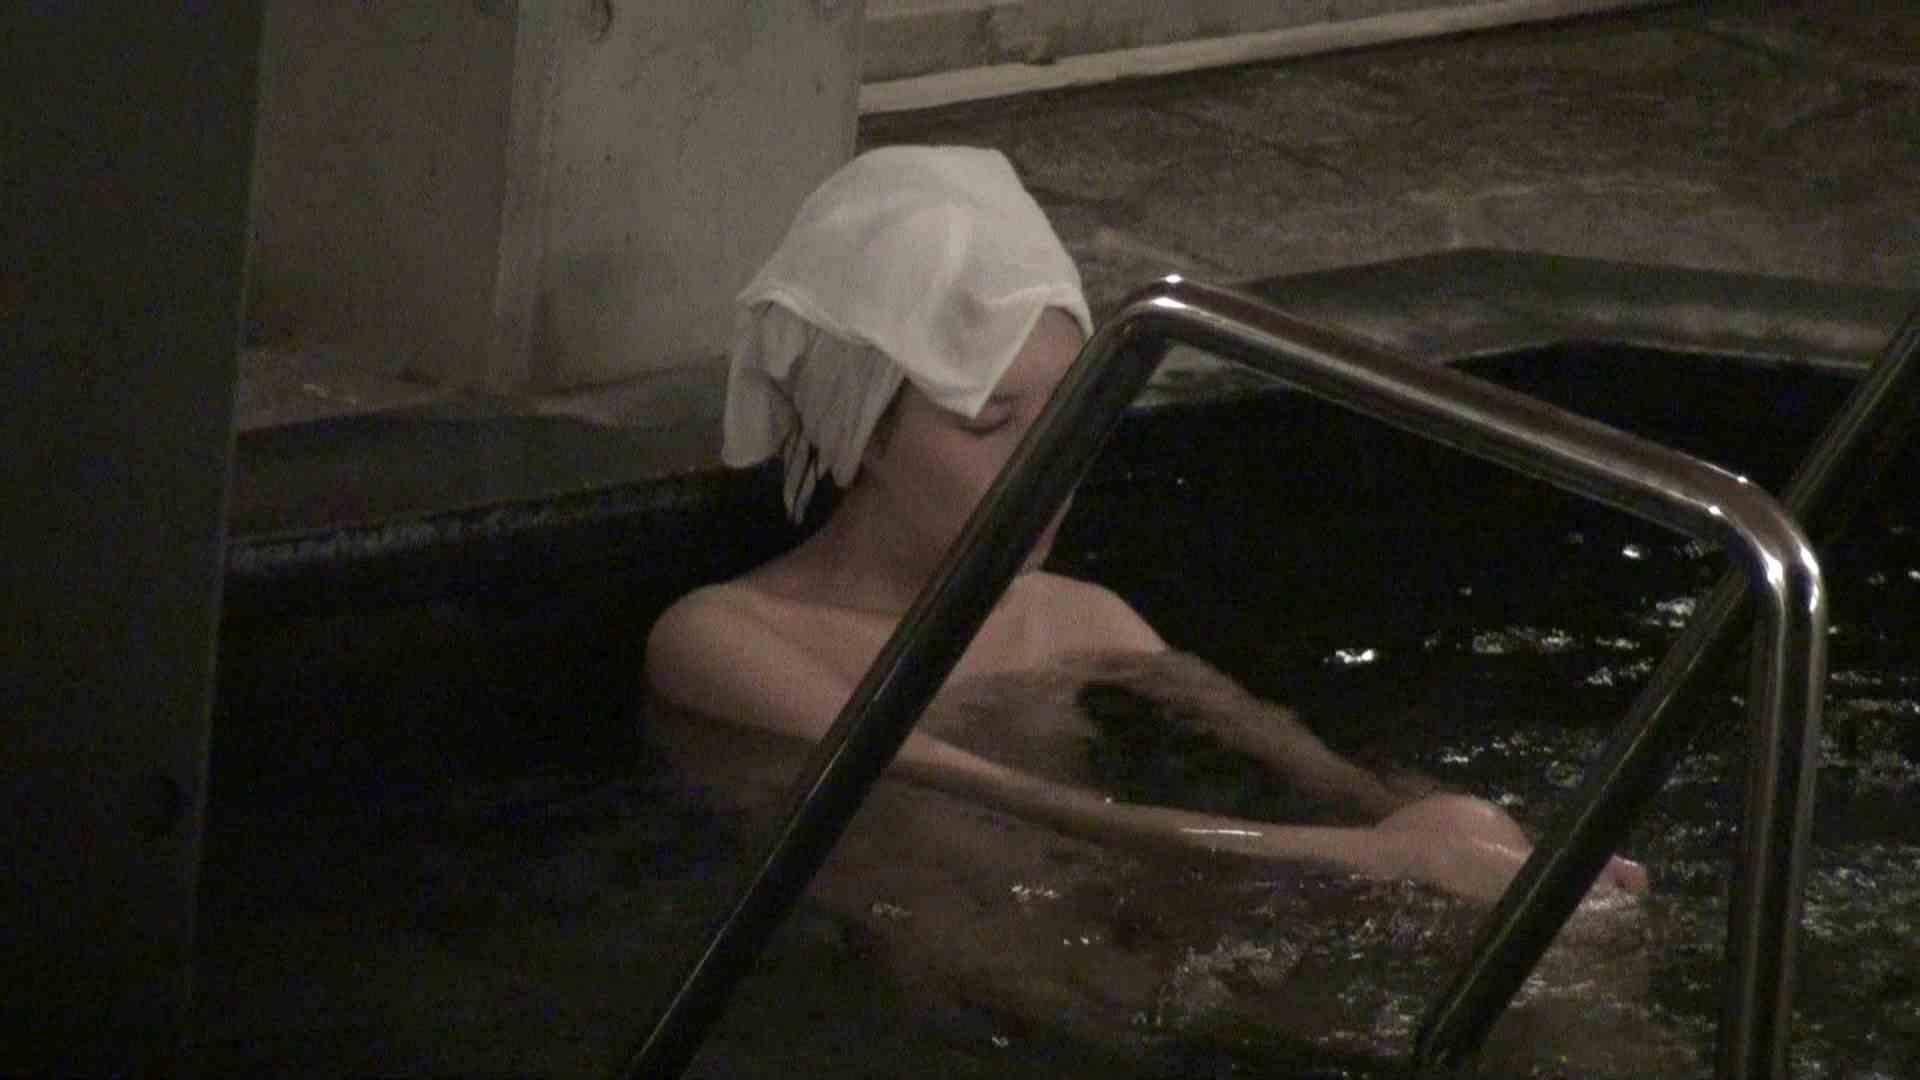 Aquaな露天風呂Vol.358 盗撮シリーズ | 露天風呂編  104PIX 49